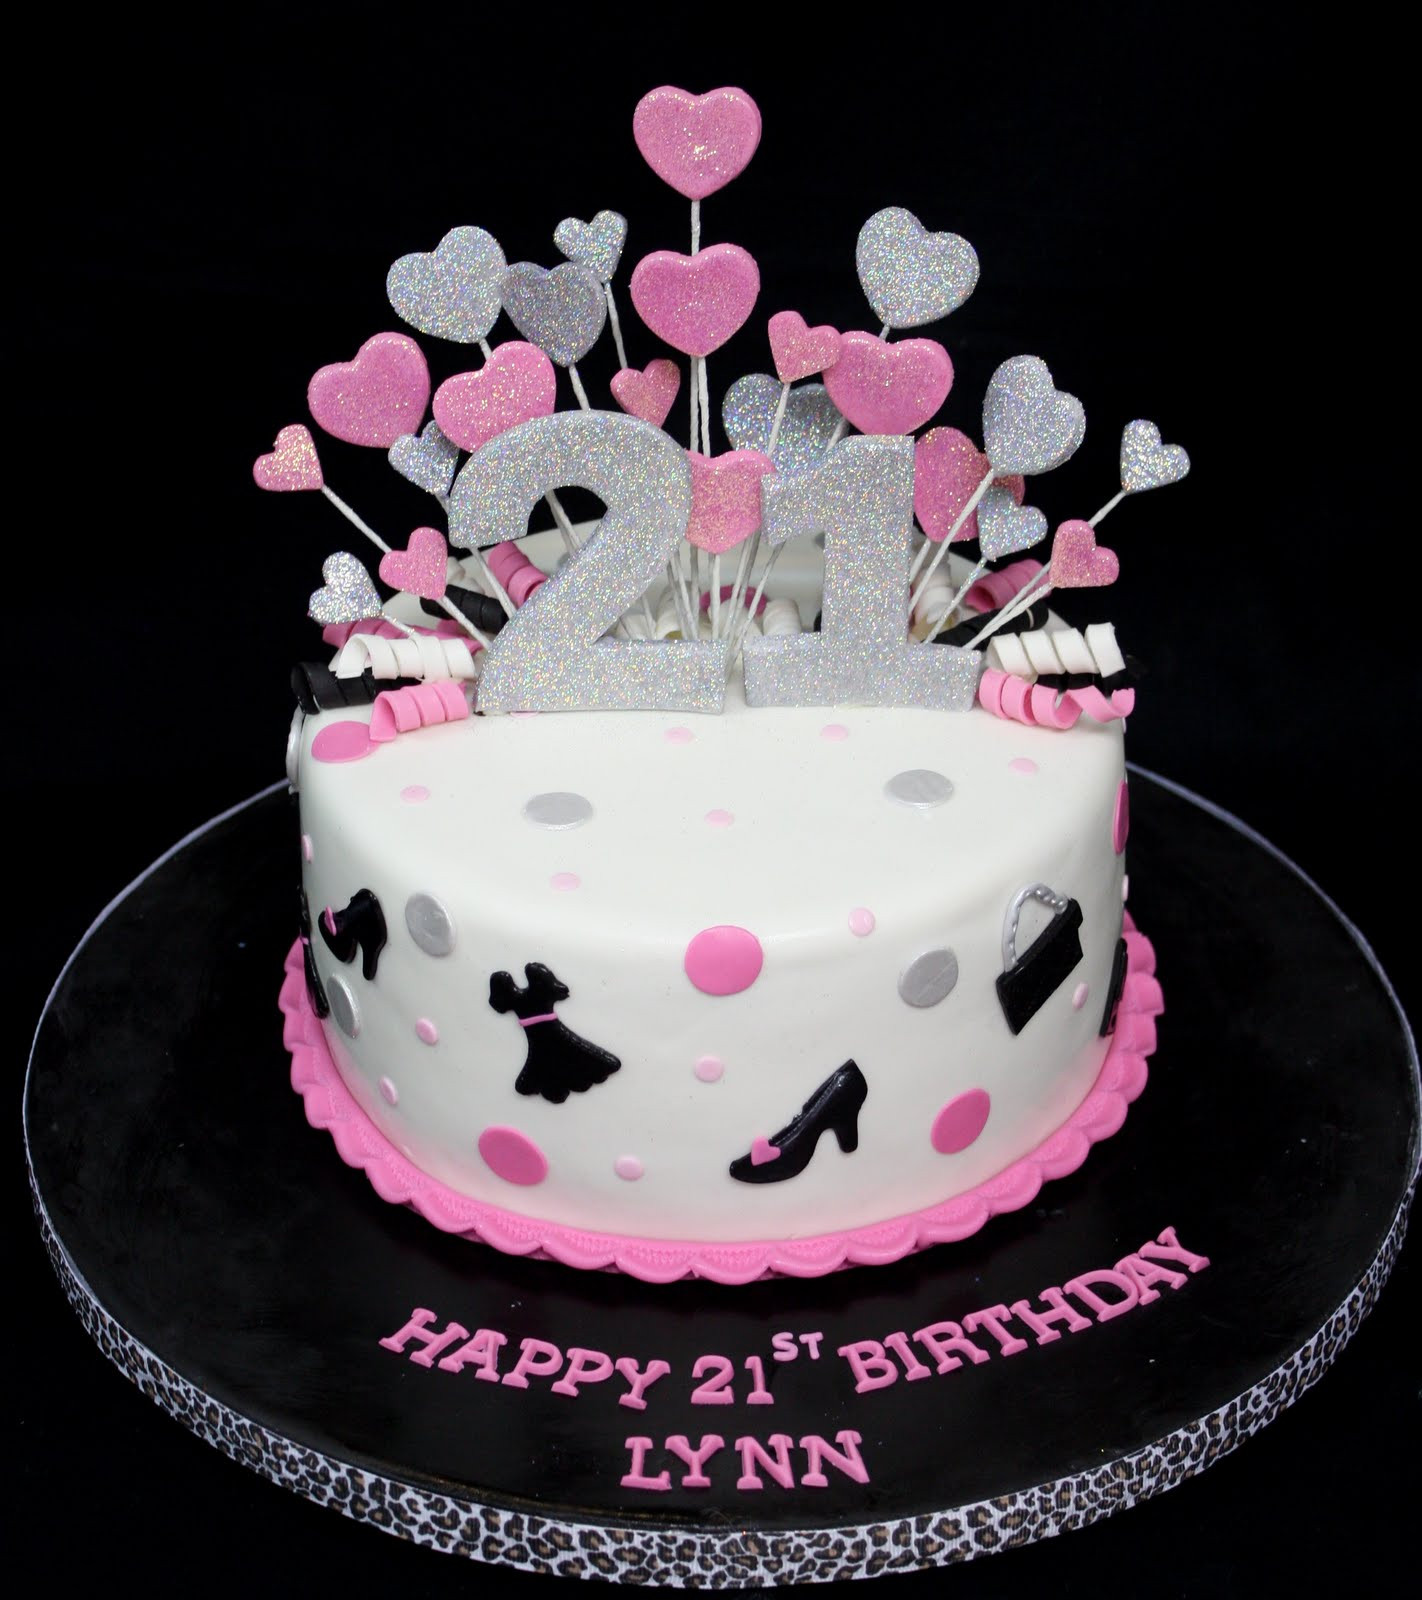 Cake Decorating Ideas For Birthday  21st Birthday Cakes – Decoration Ideas